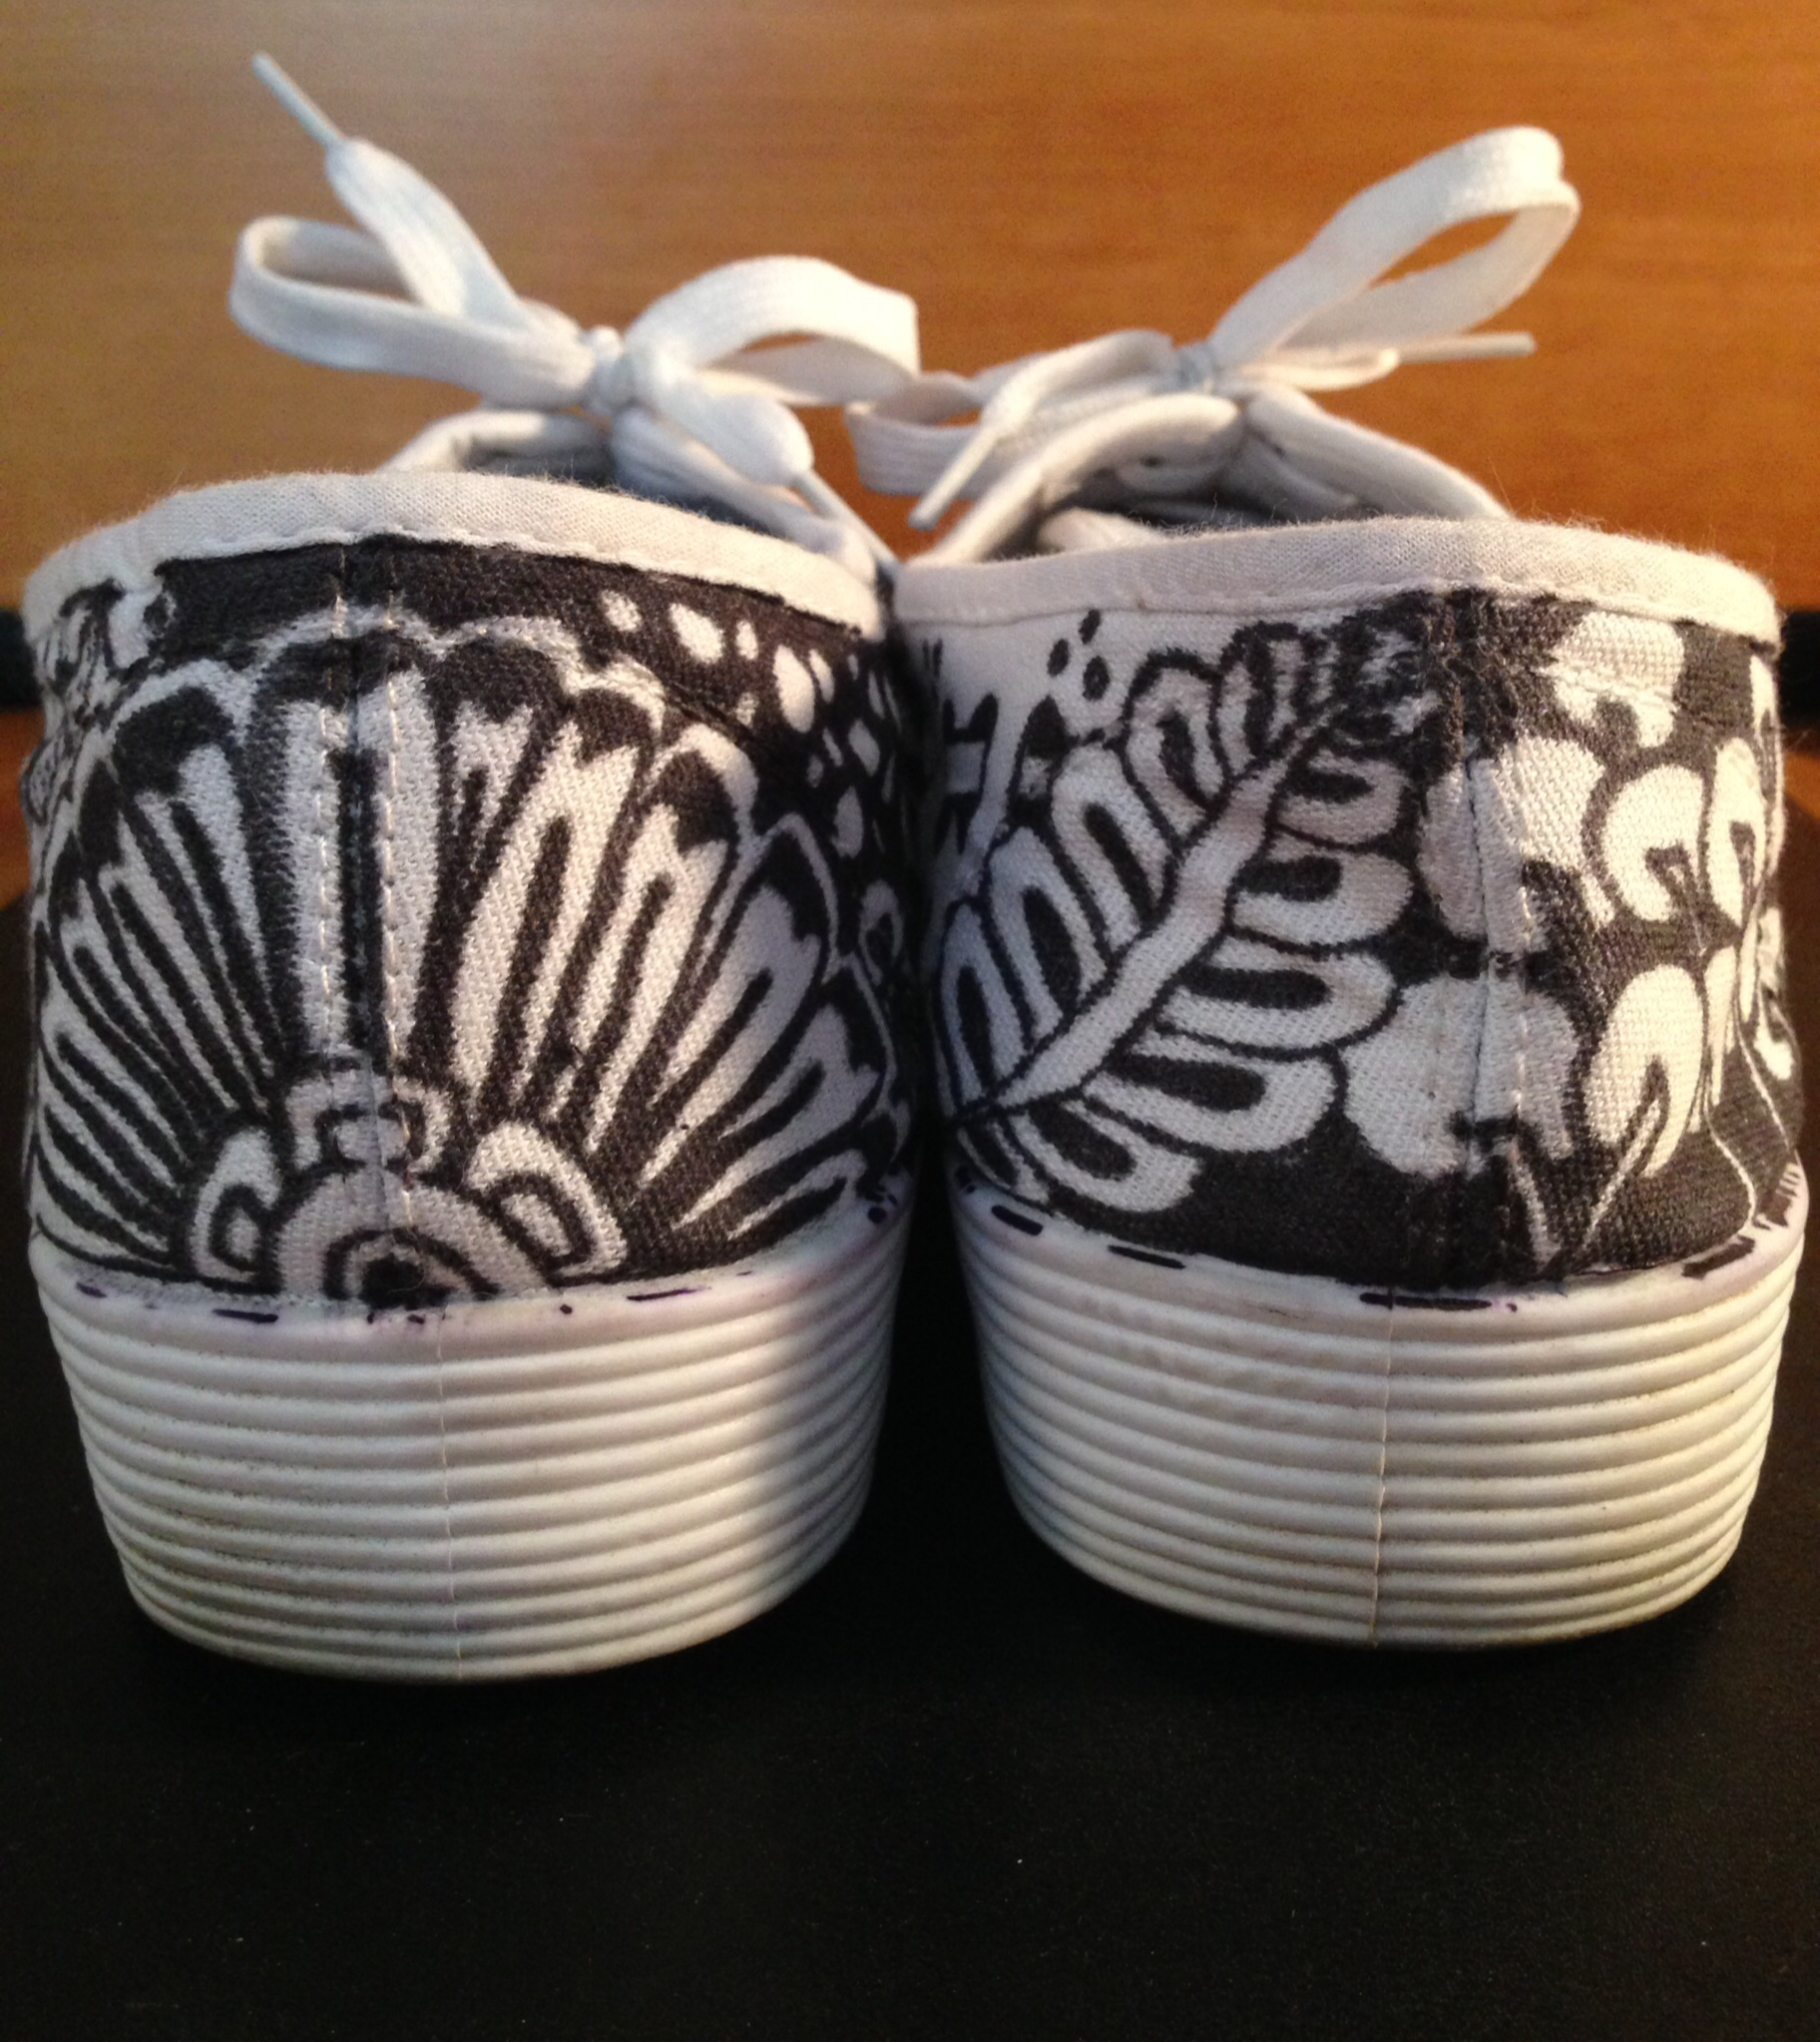 sneakers-back